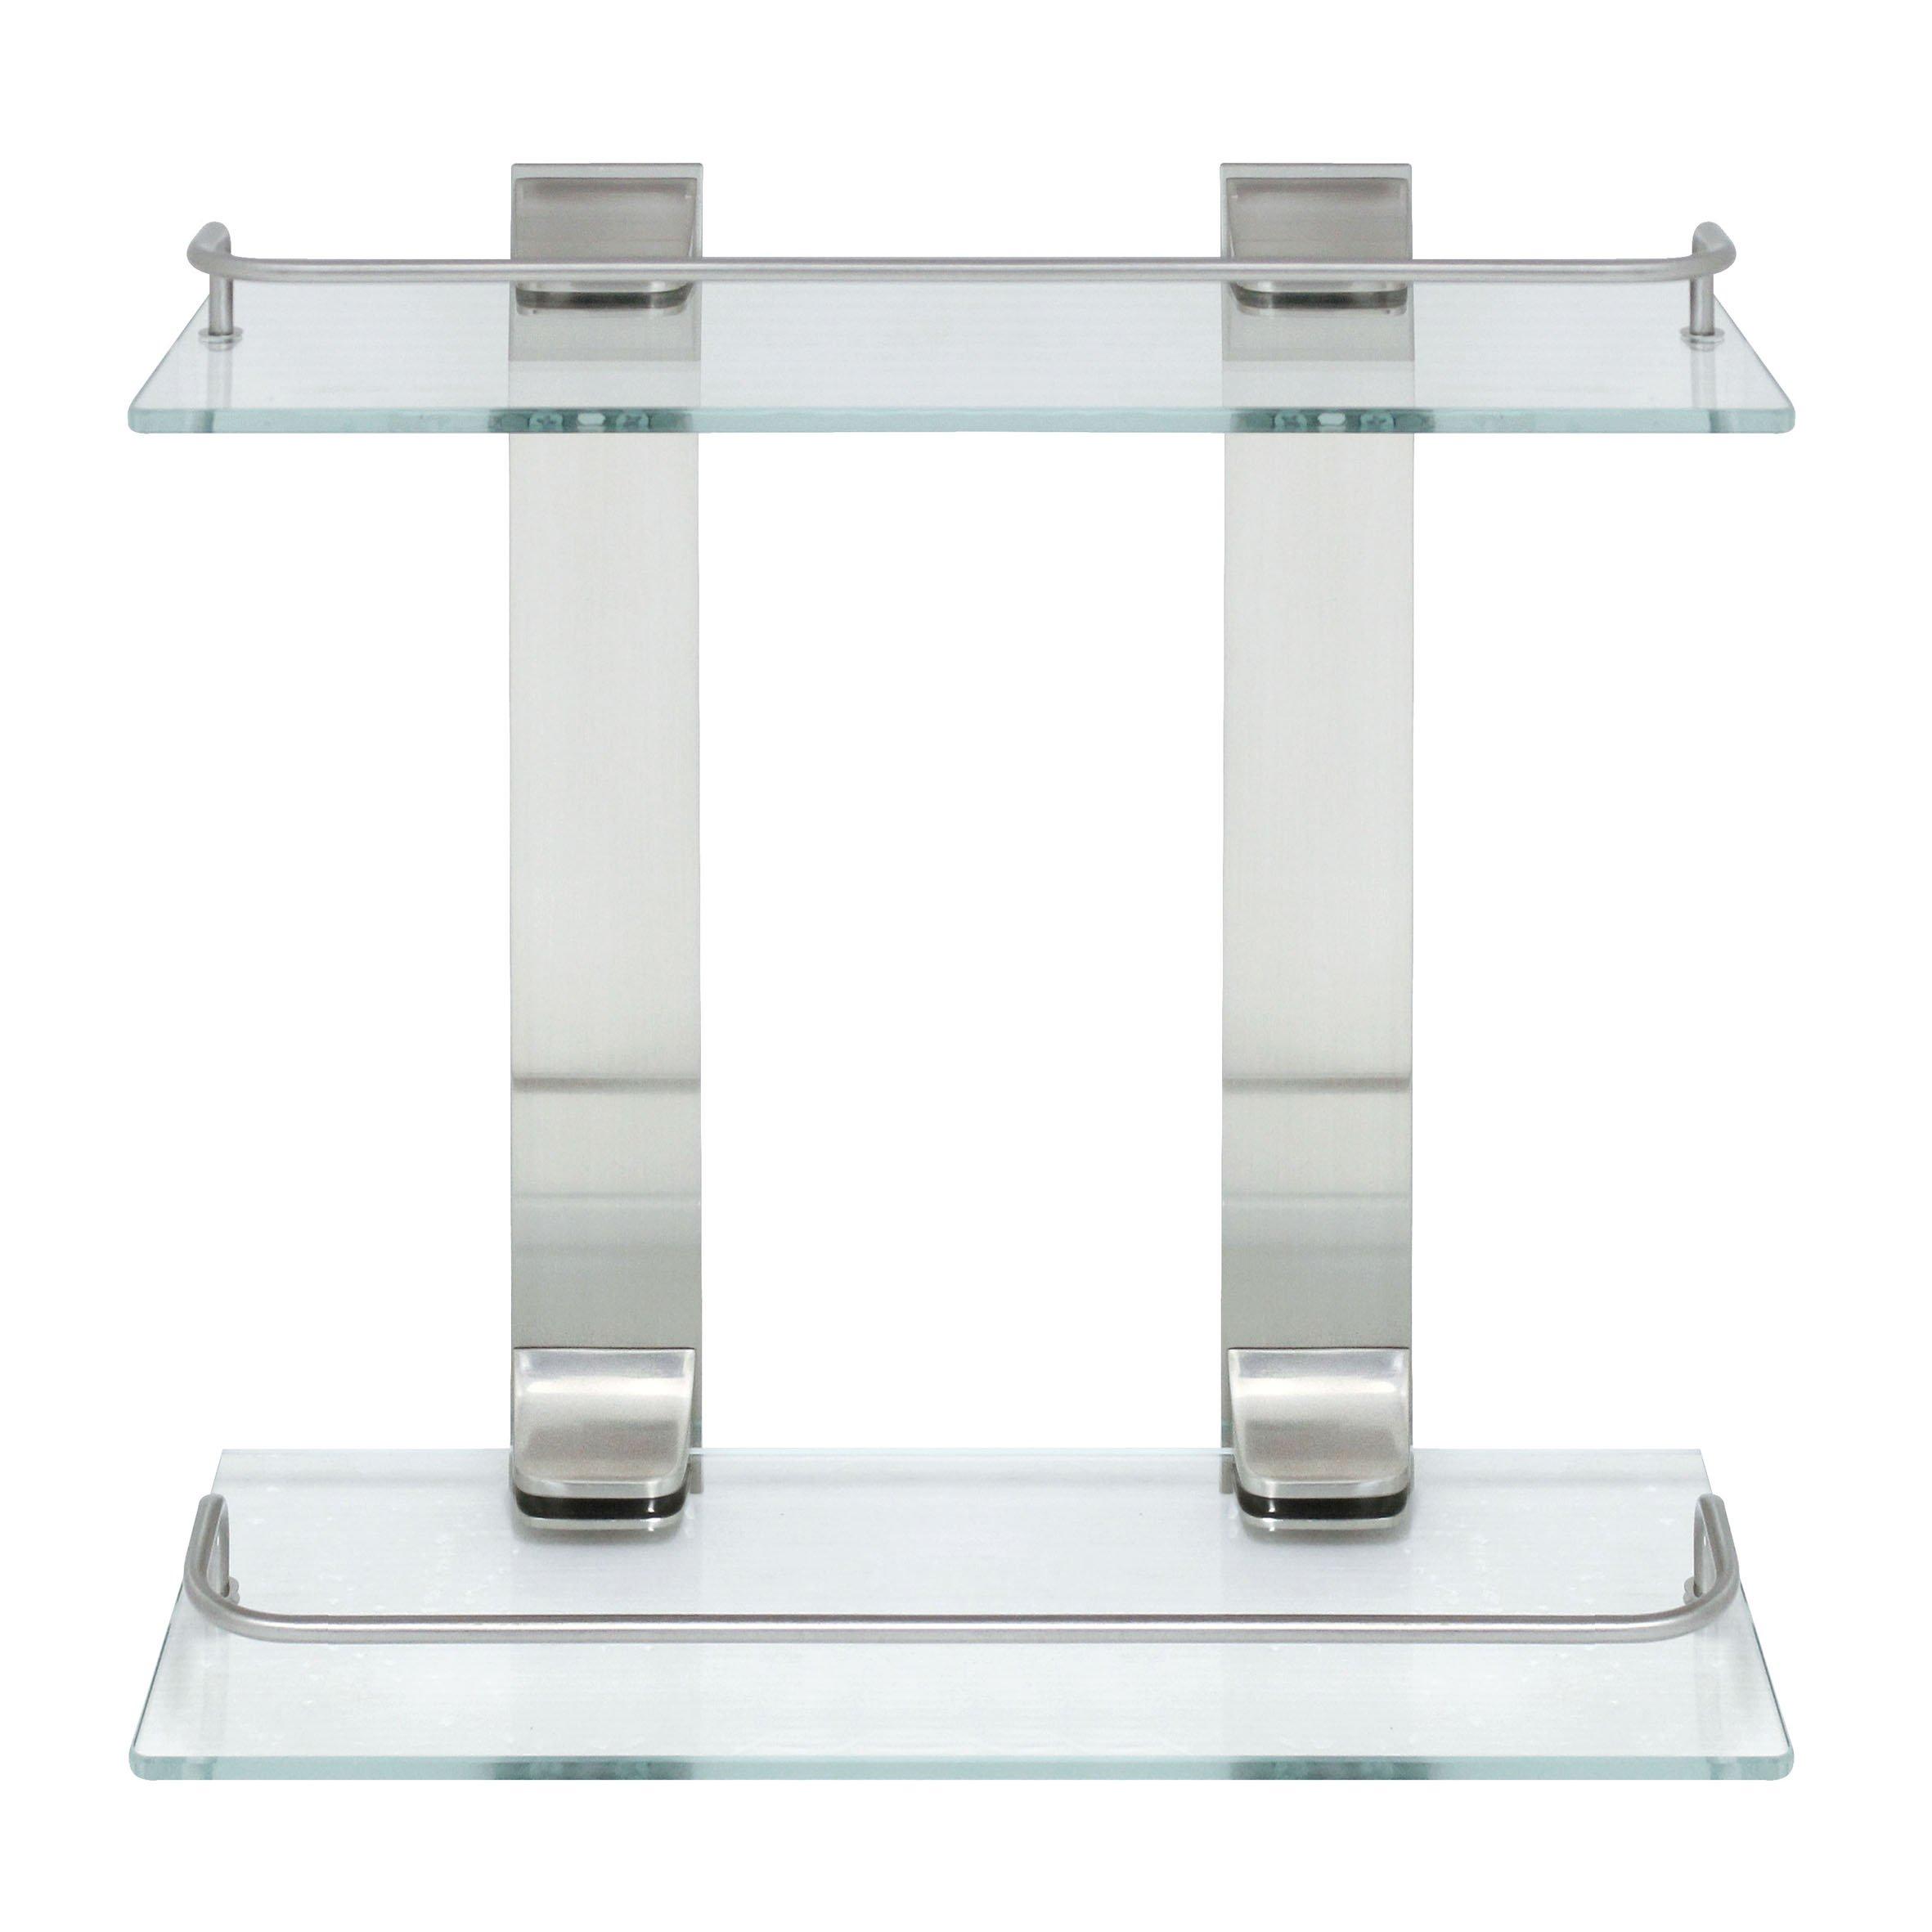 MODONA Double Glass Wall Shelf with Rail – Satin Nickel – 5 Year Warrantee